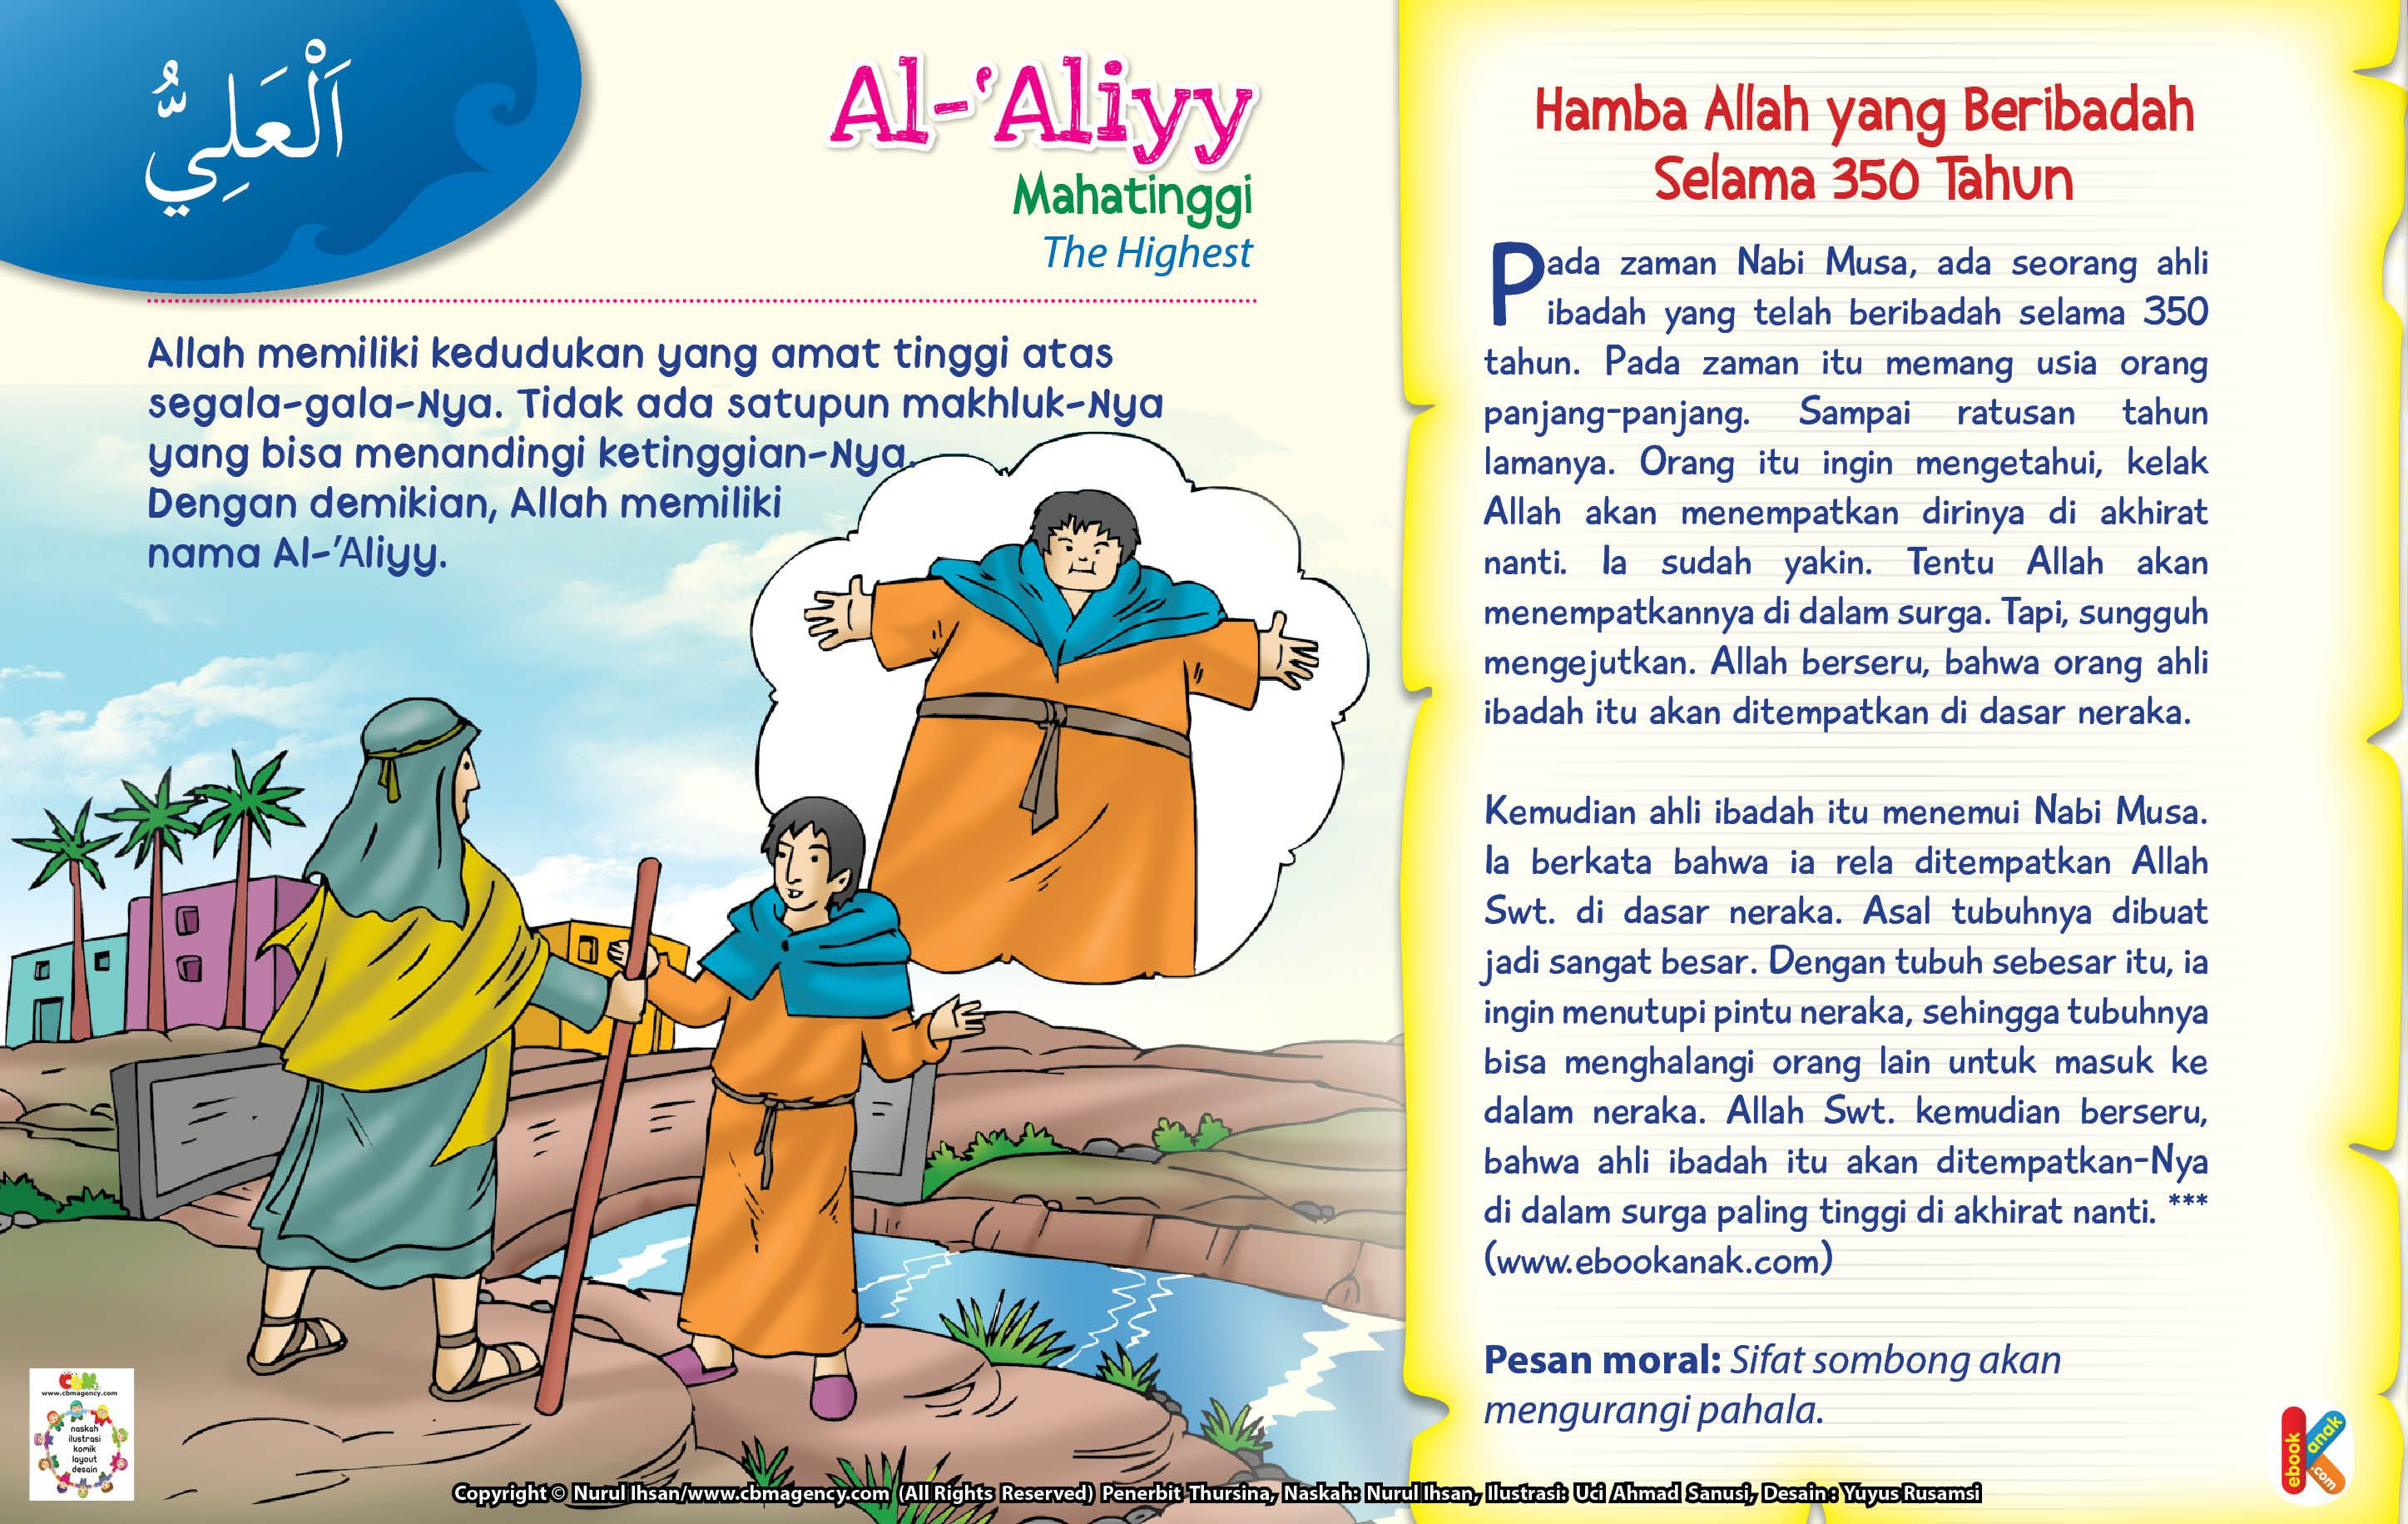 Kisah Asma Ul Husna Al Aliiy Ebook Anak Buku Anak Buku Anak